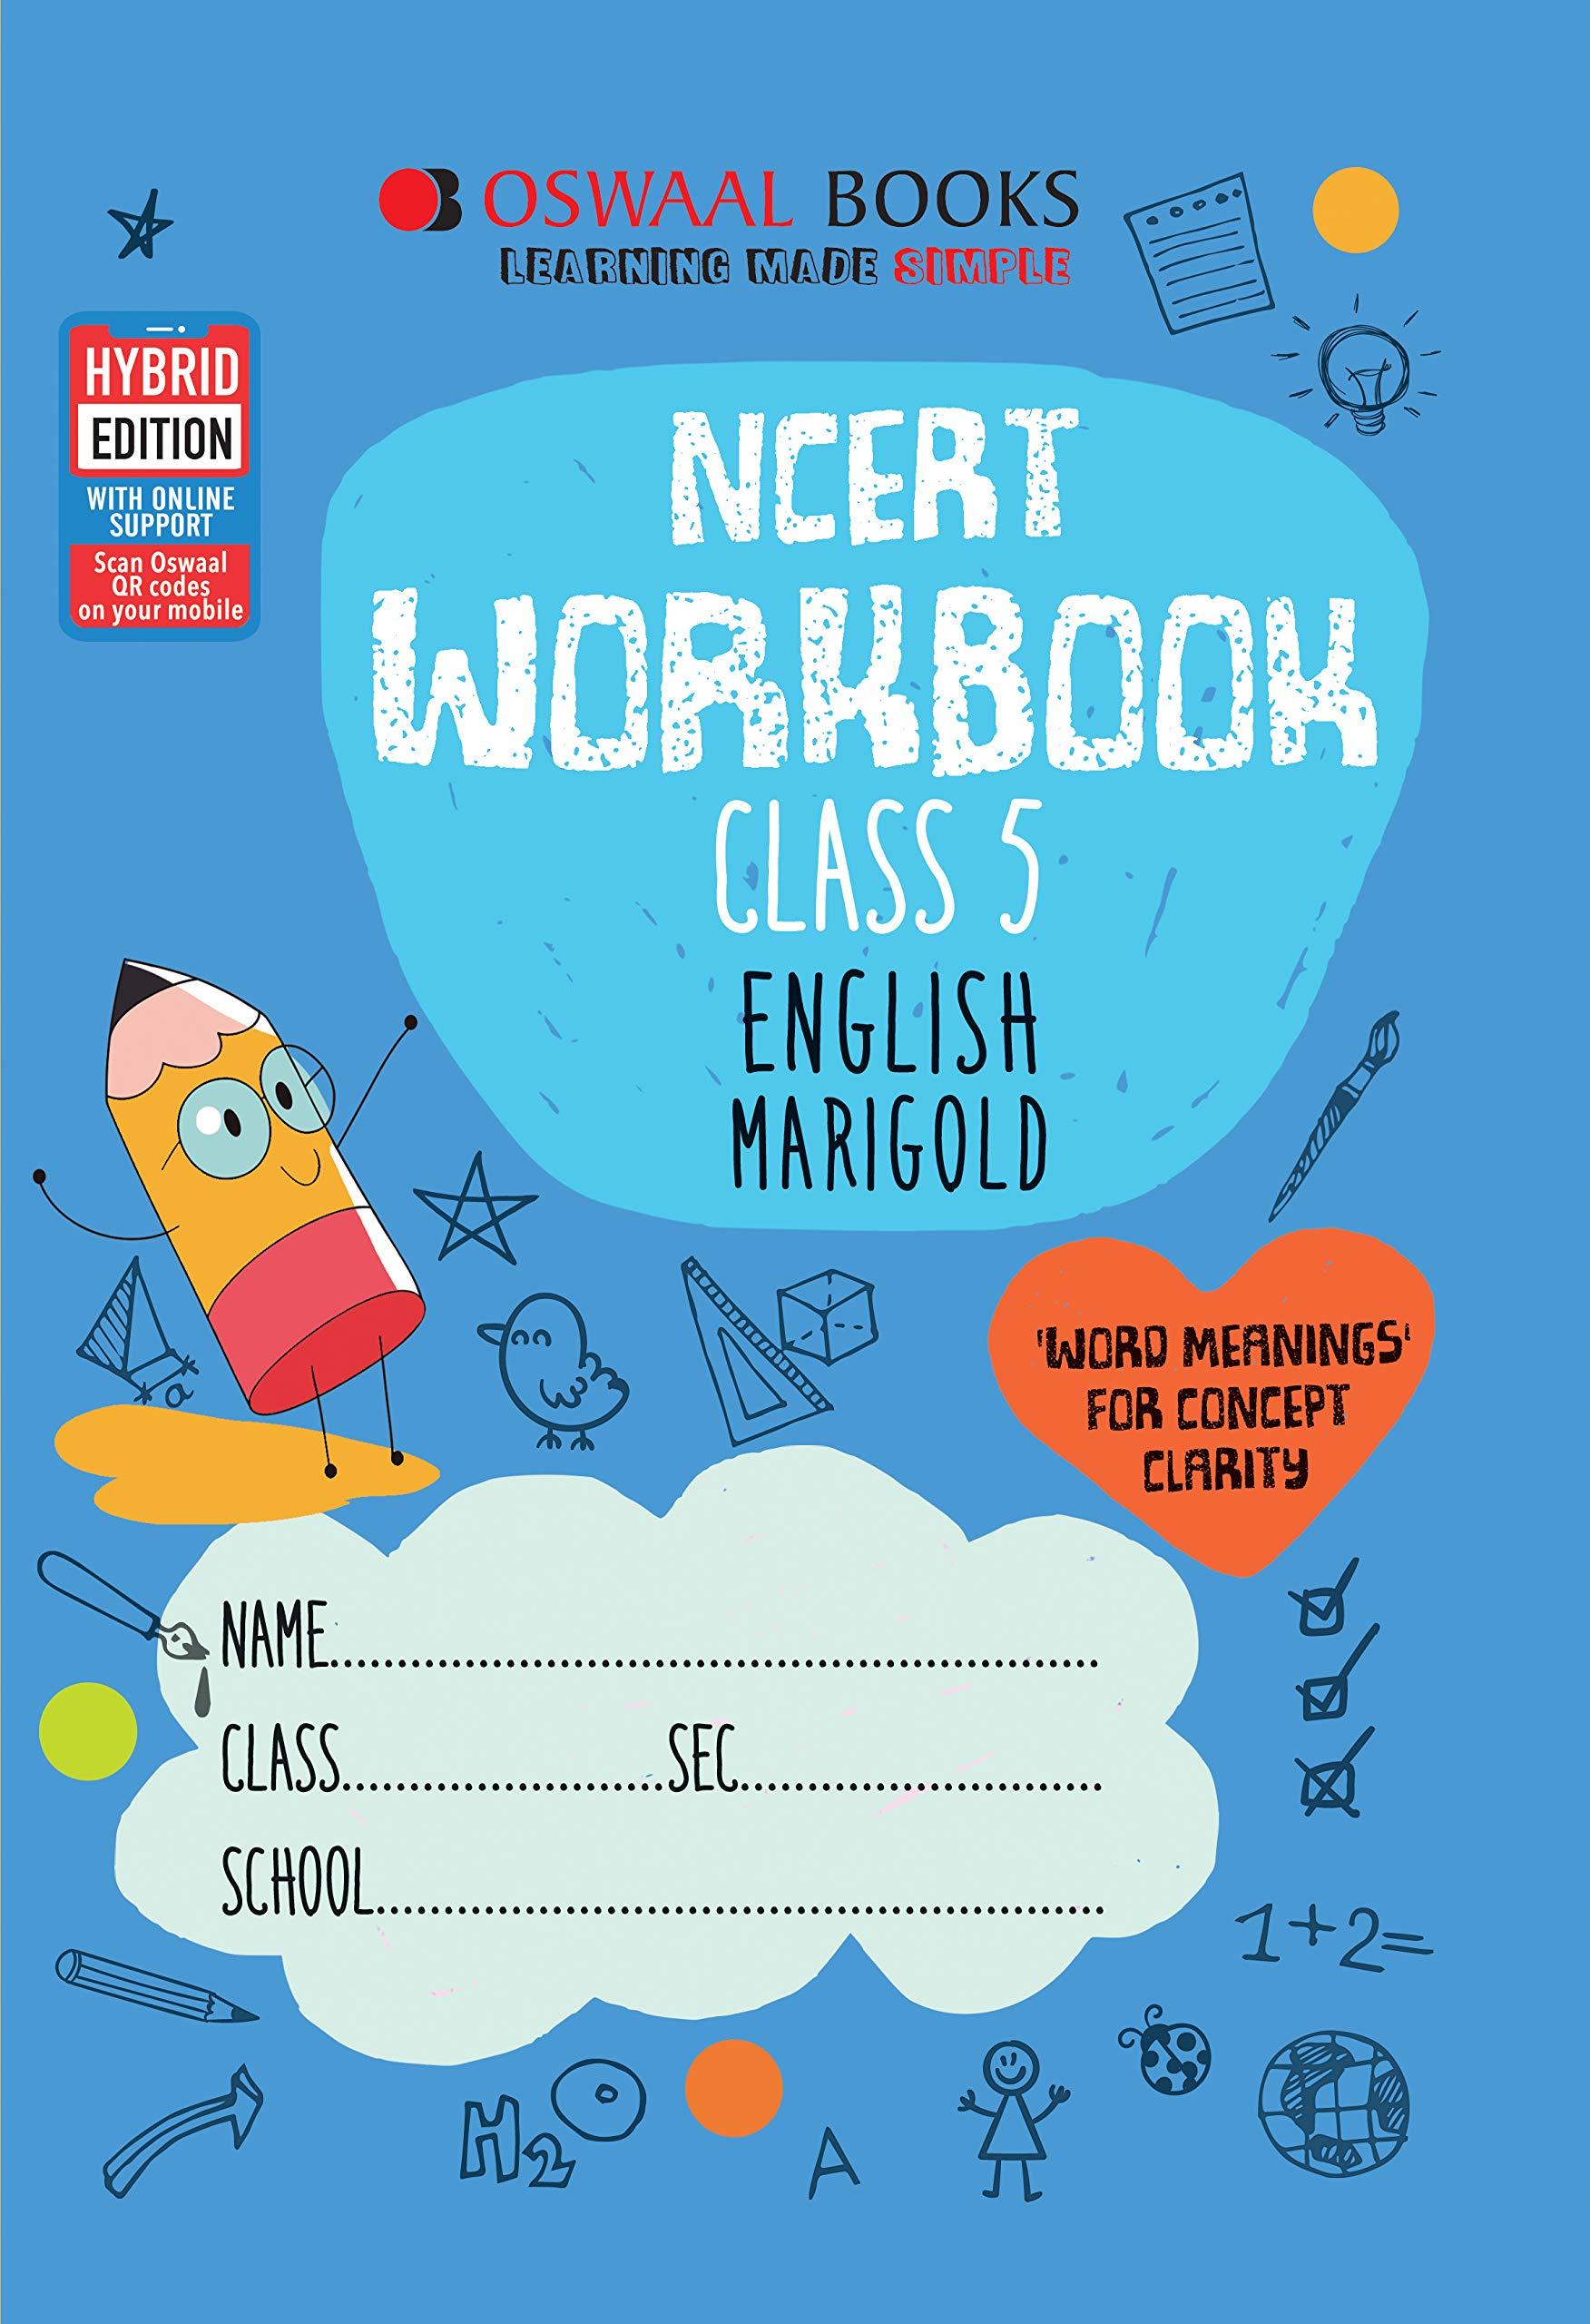 Oswaal NCERT Workbook Class 5 English Marigold Book